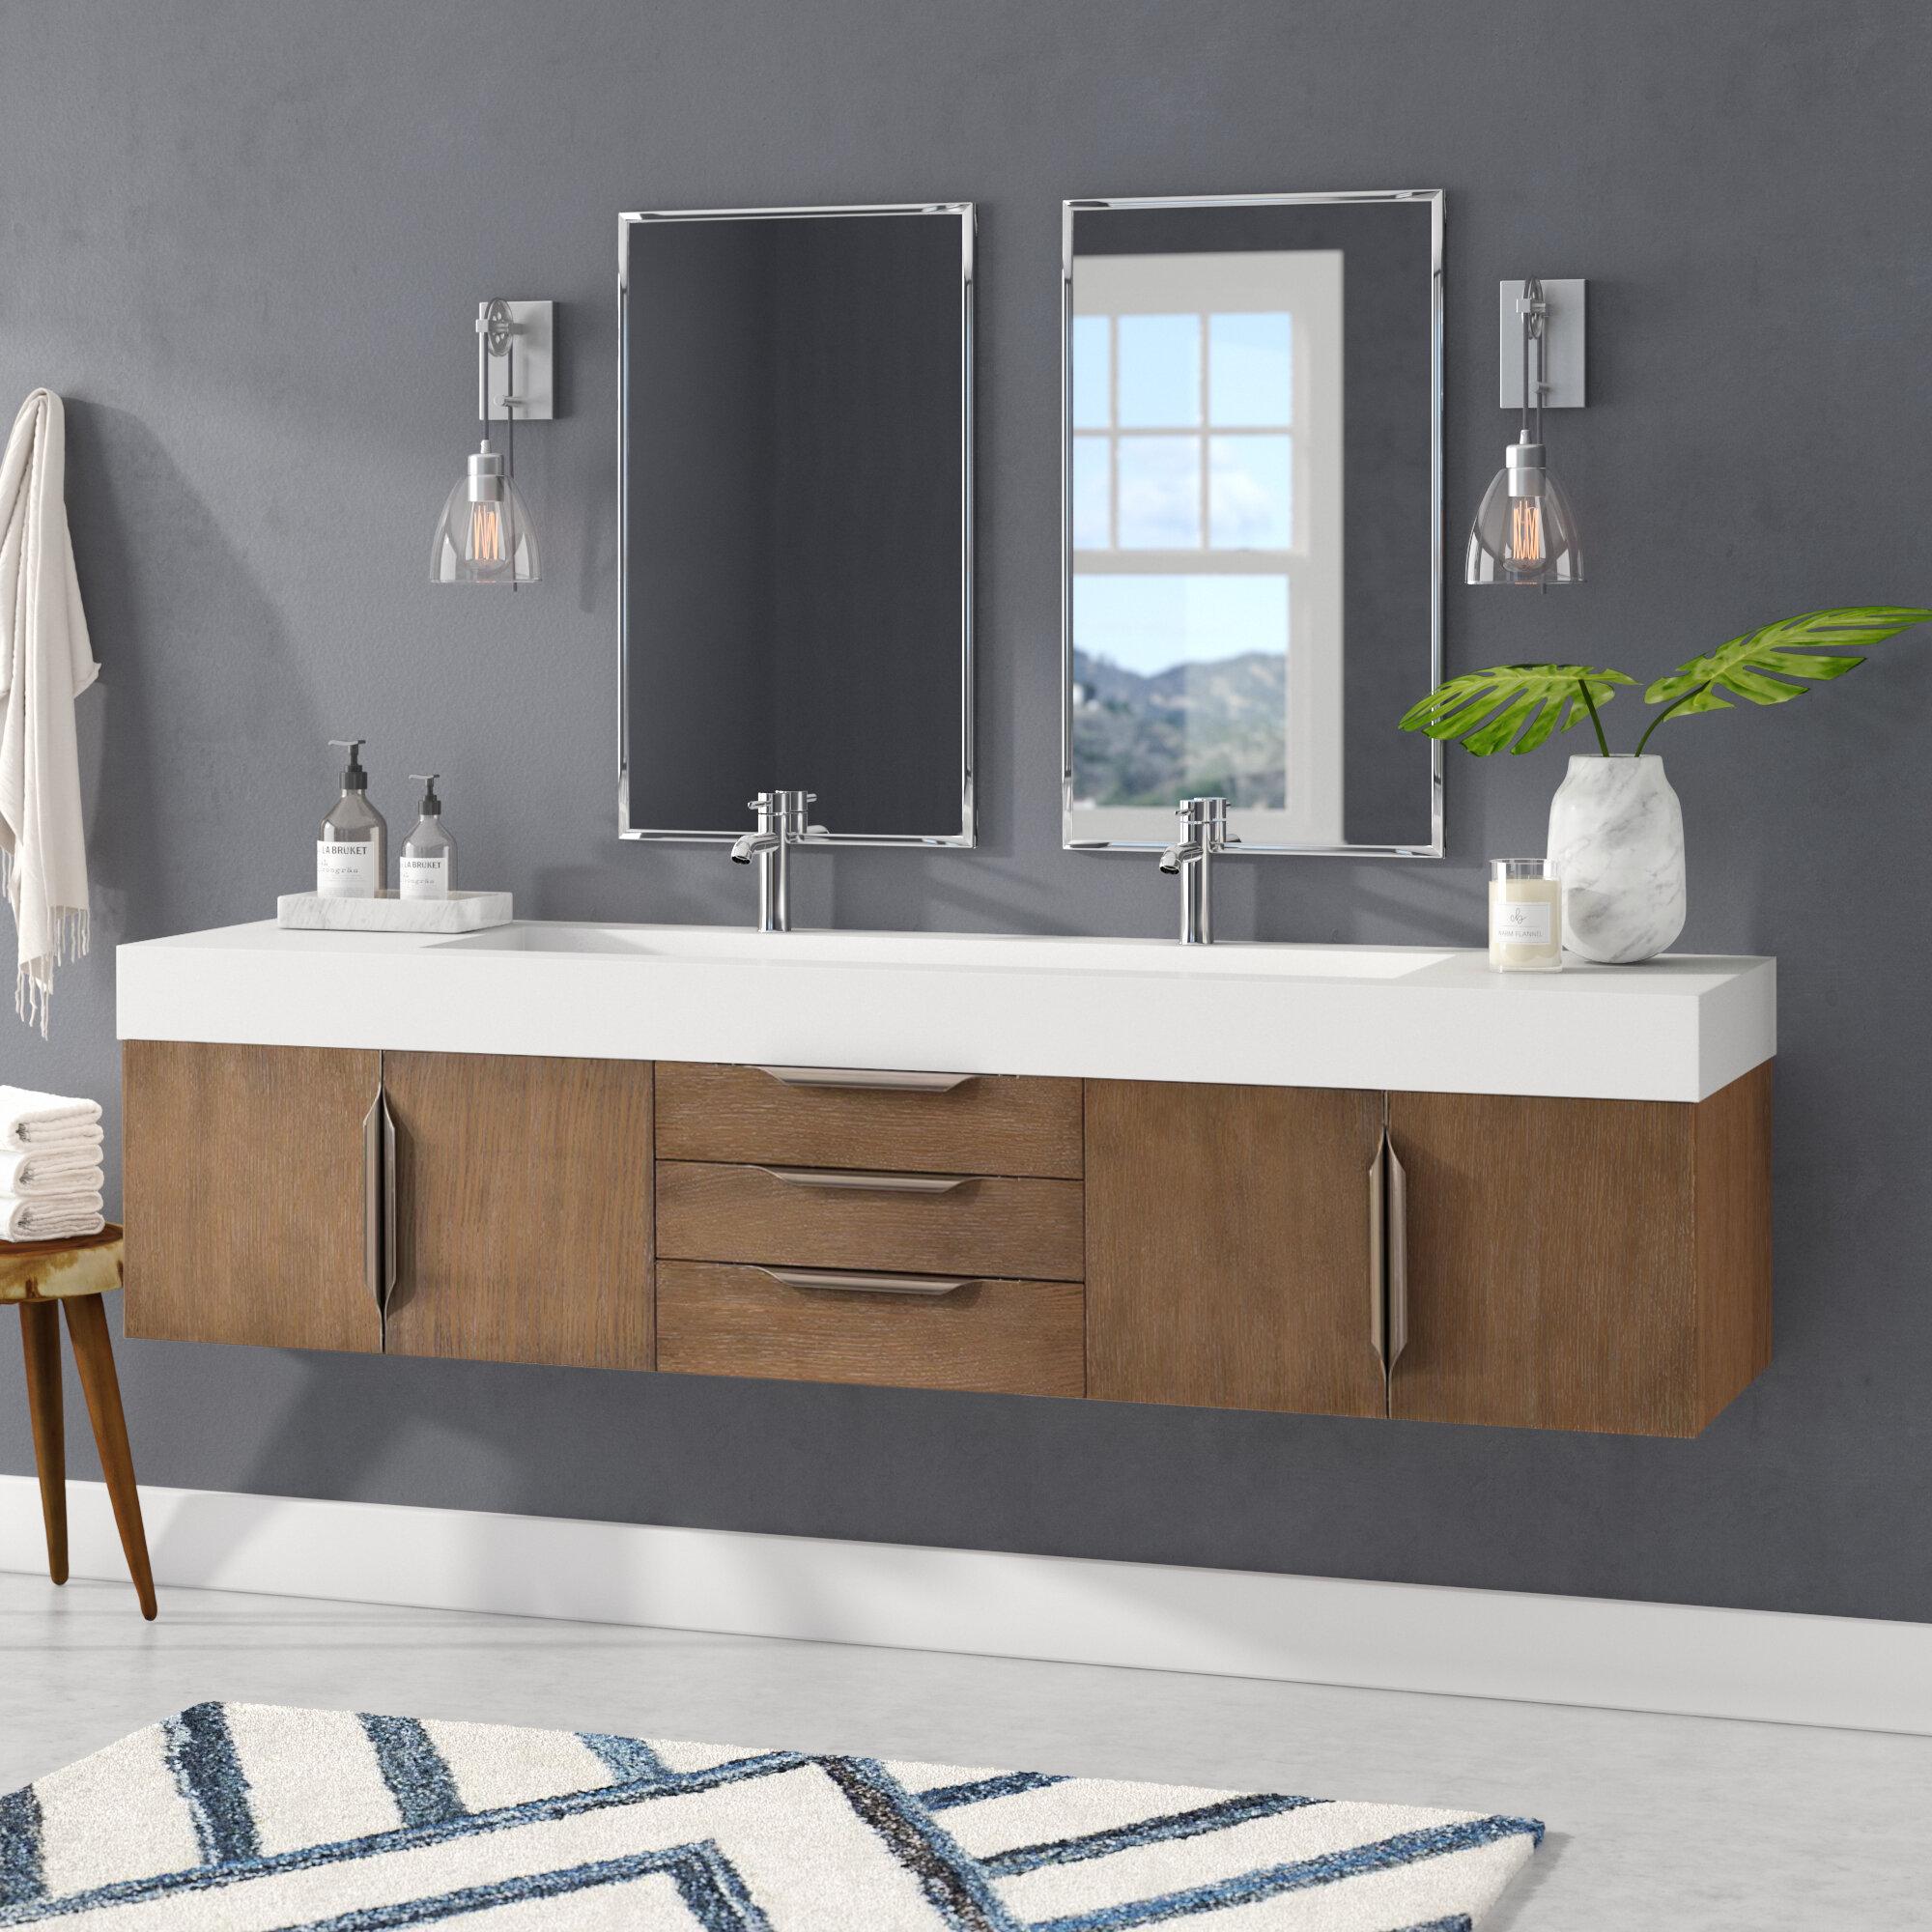 Brayden Studio Hukill 72 Wall Mounted Double Bathroom Vanity Set Reviews Wayfair